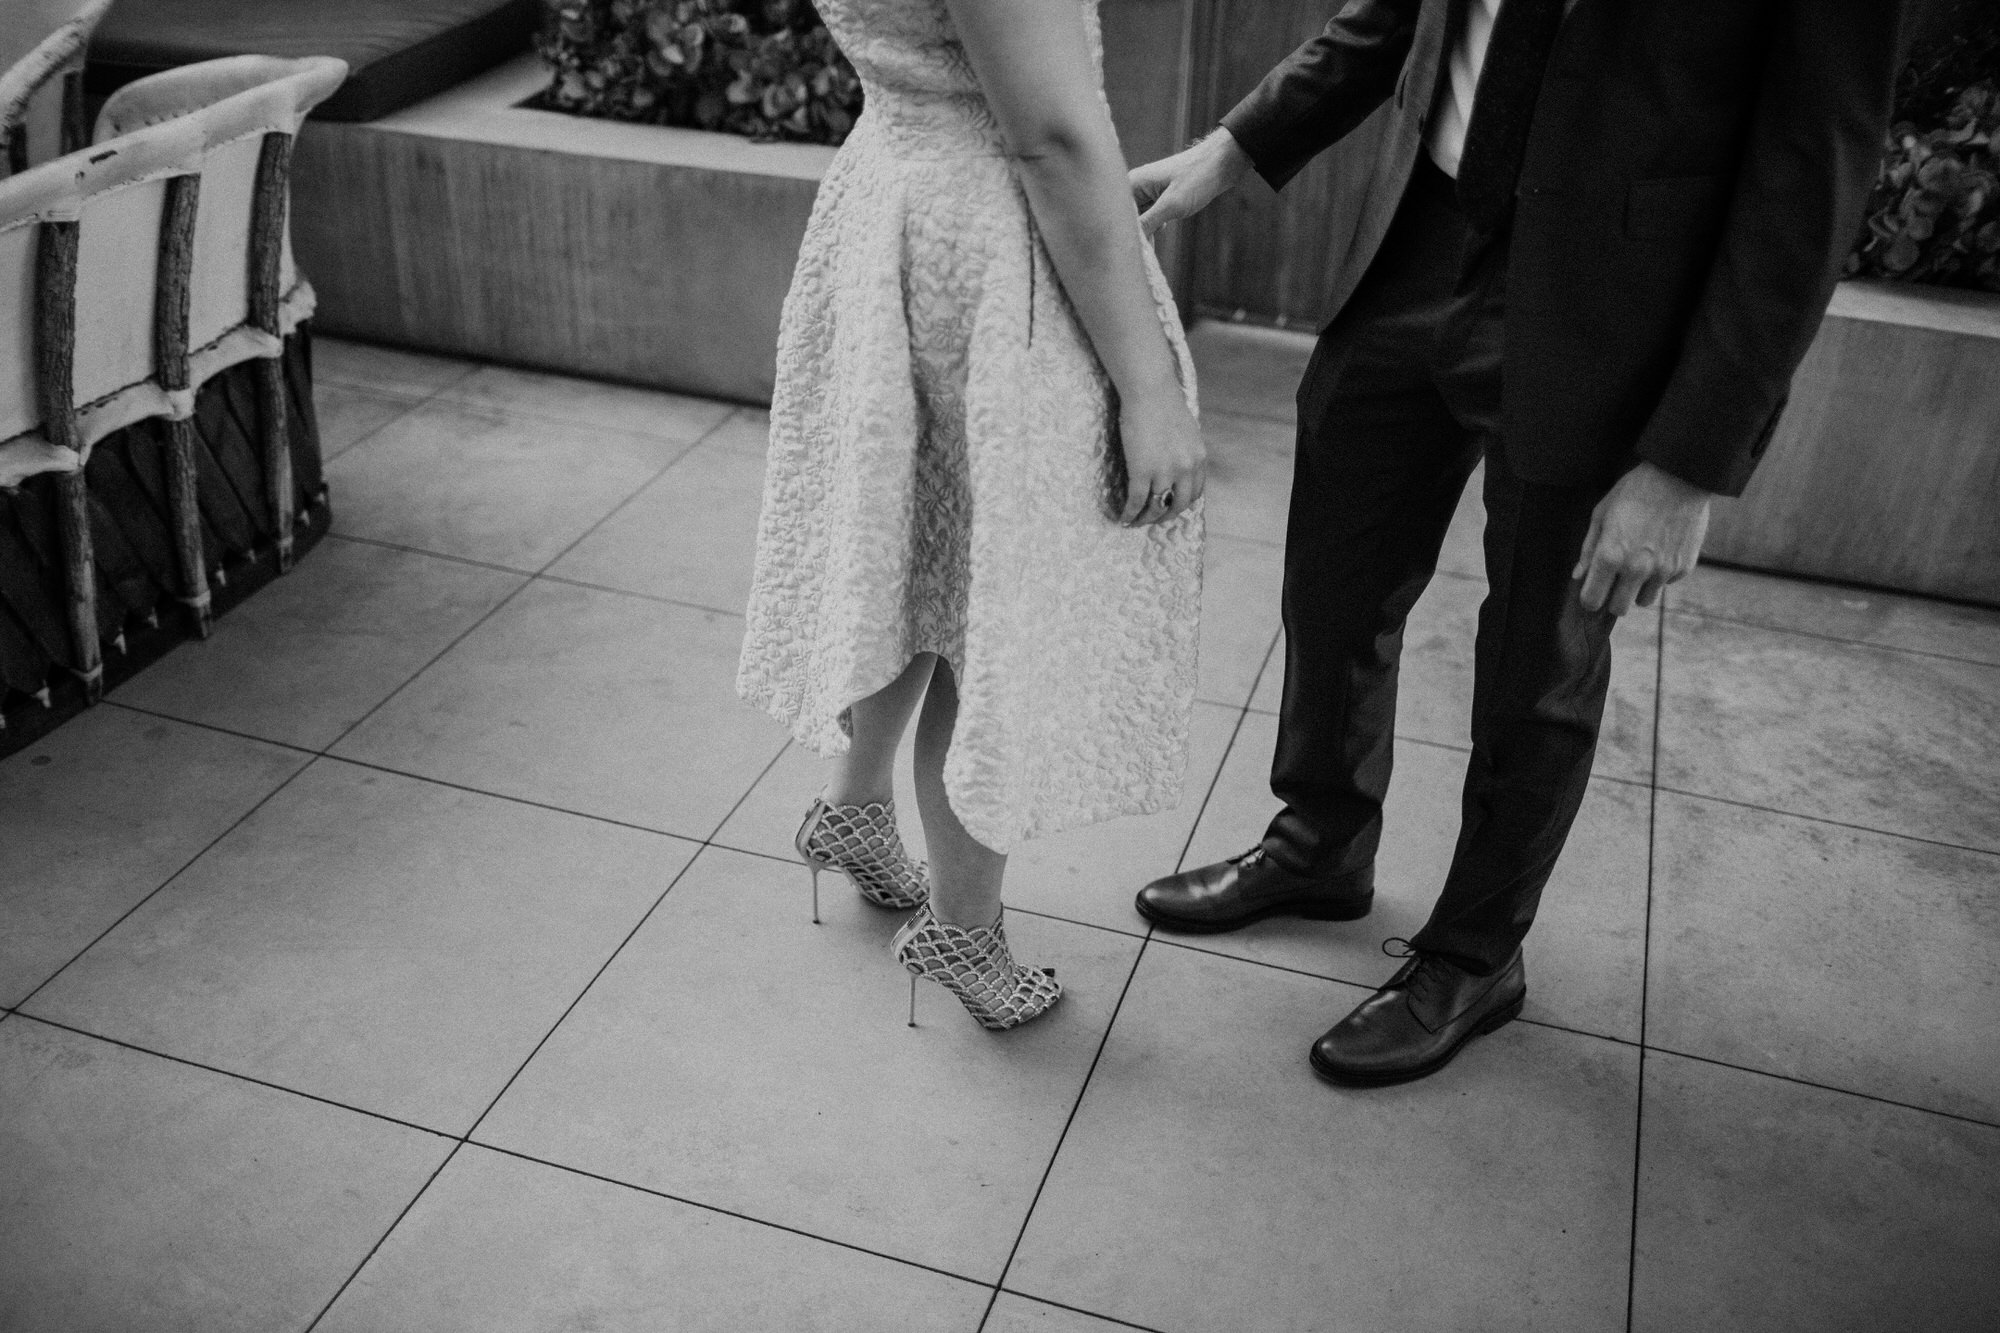 los-angeles-wedding-photographer-millwick-58.jpg